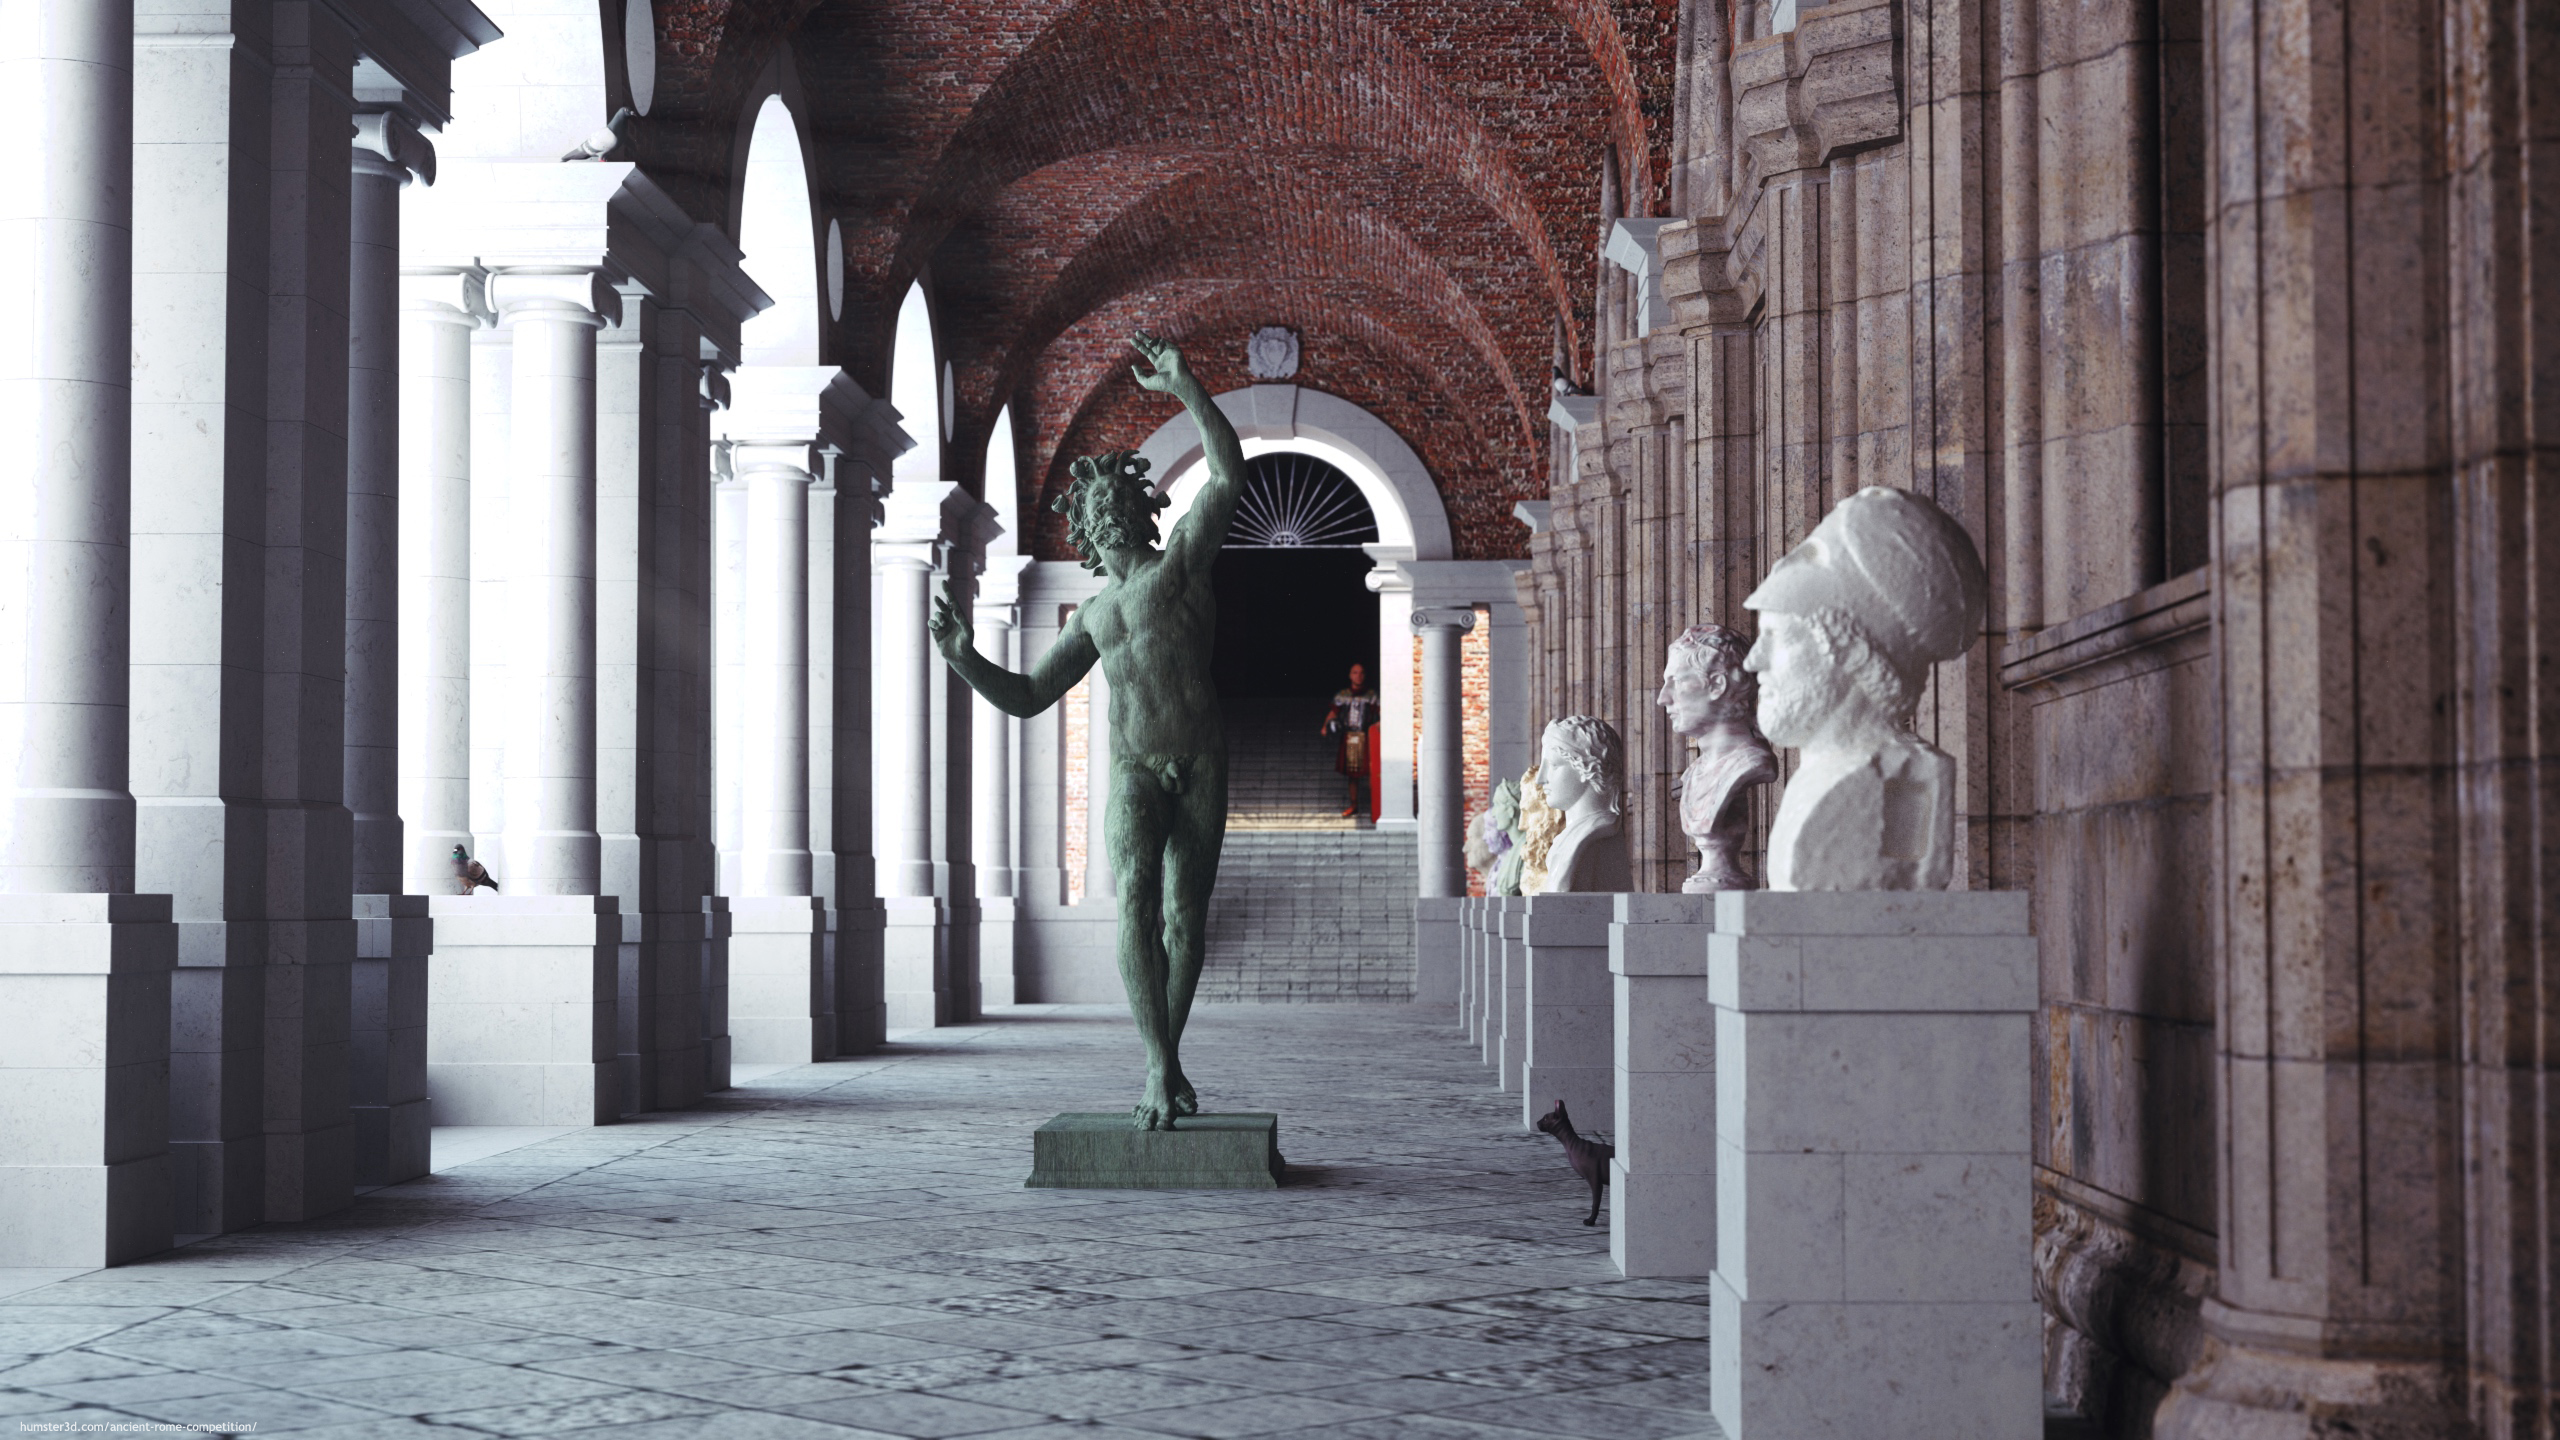 Basilica Palladiana 3d art